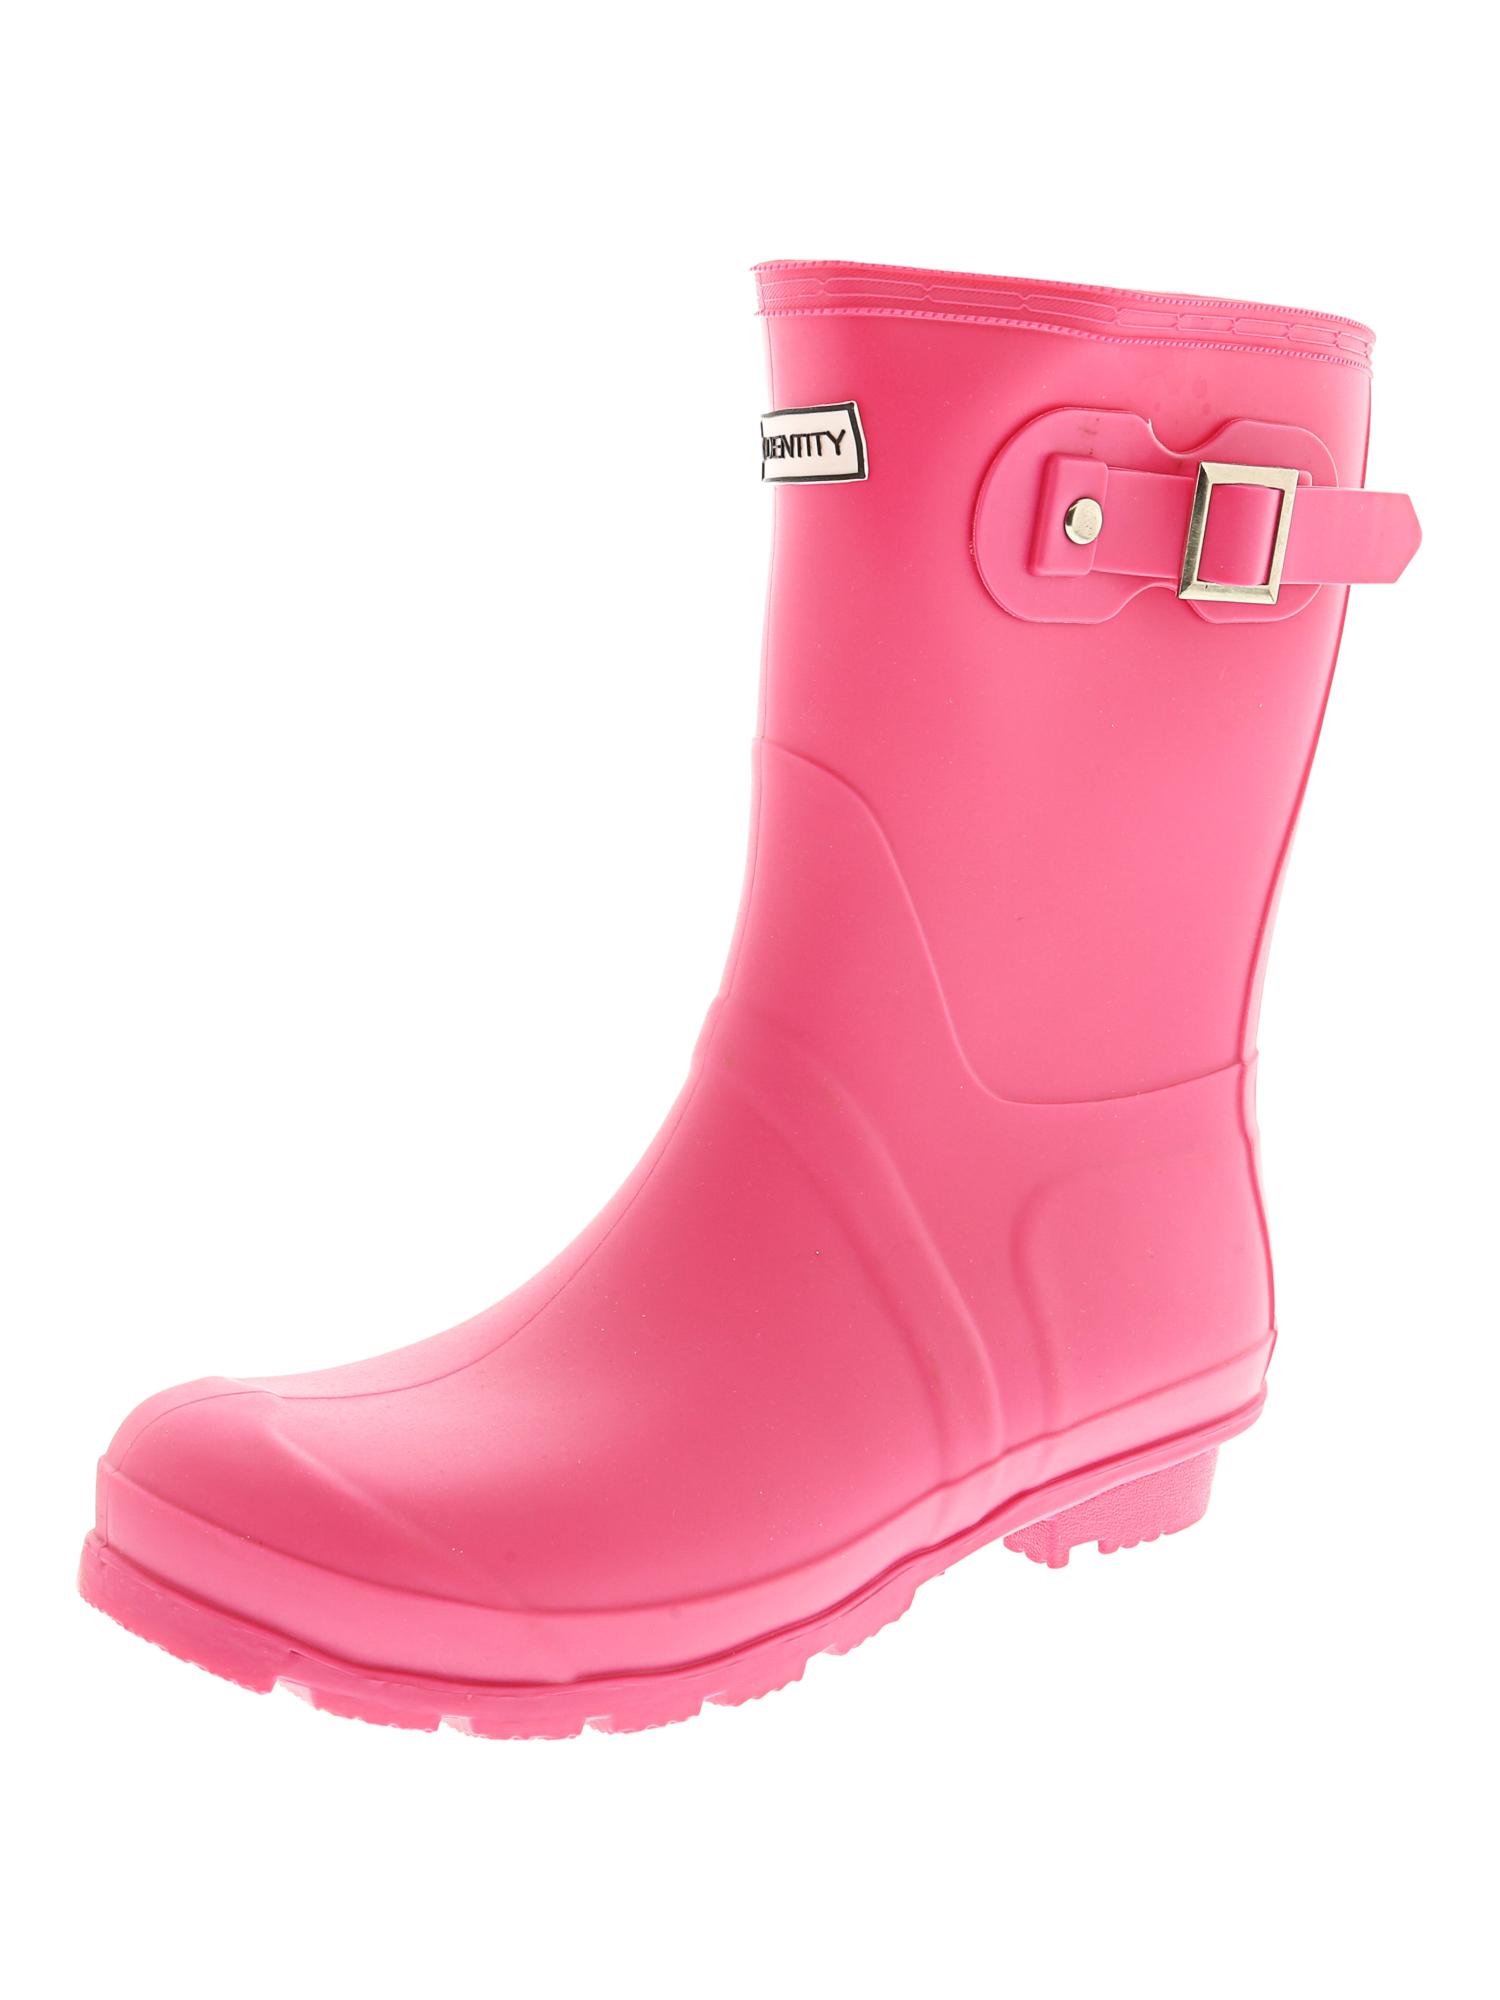 Exotic-Identity-Short-Rain-Boots-Non-Slip-100-Waterproof-for-Women thumbnail 13